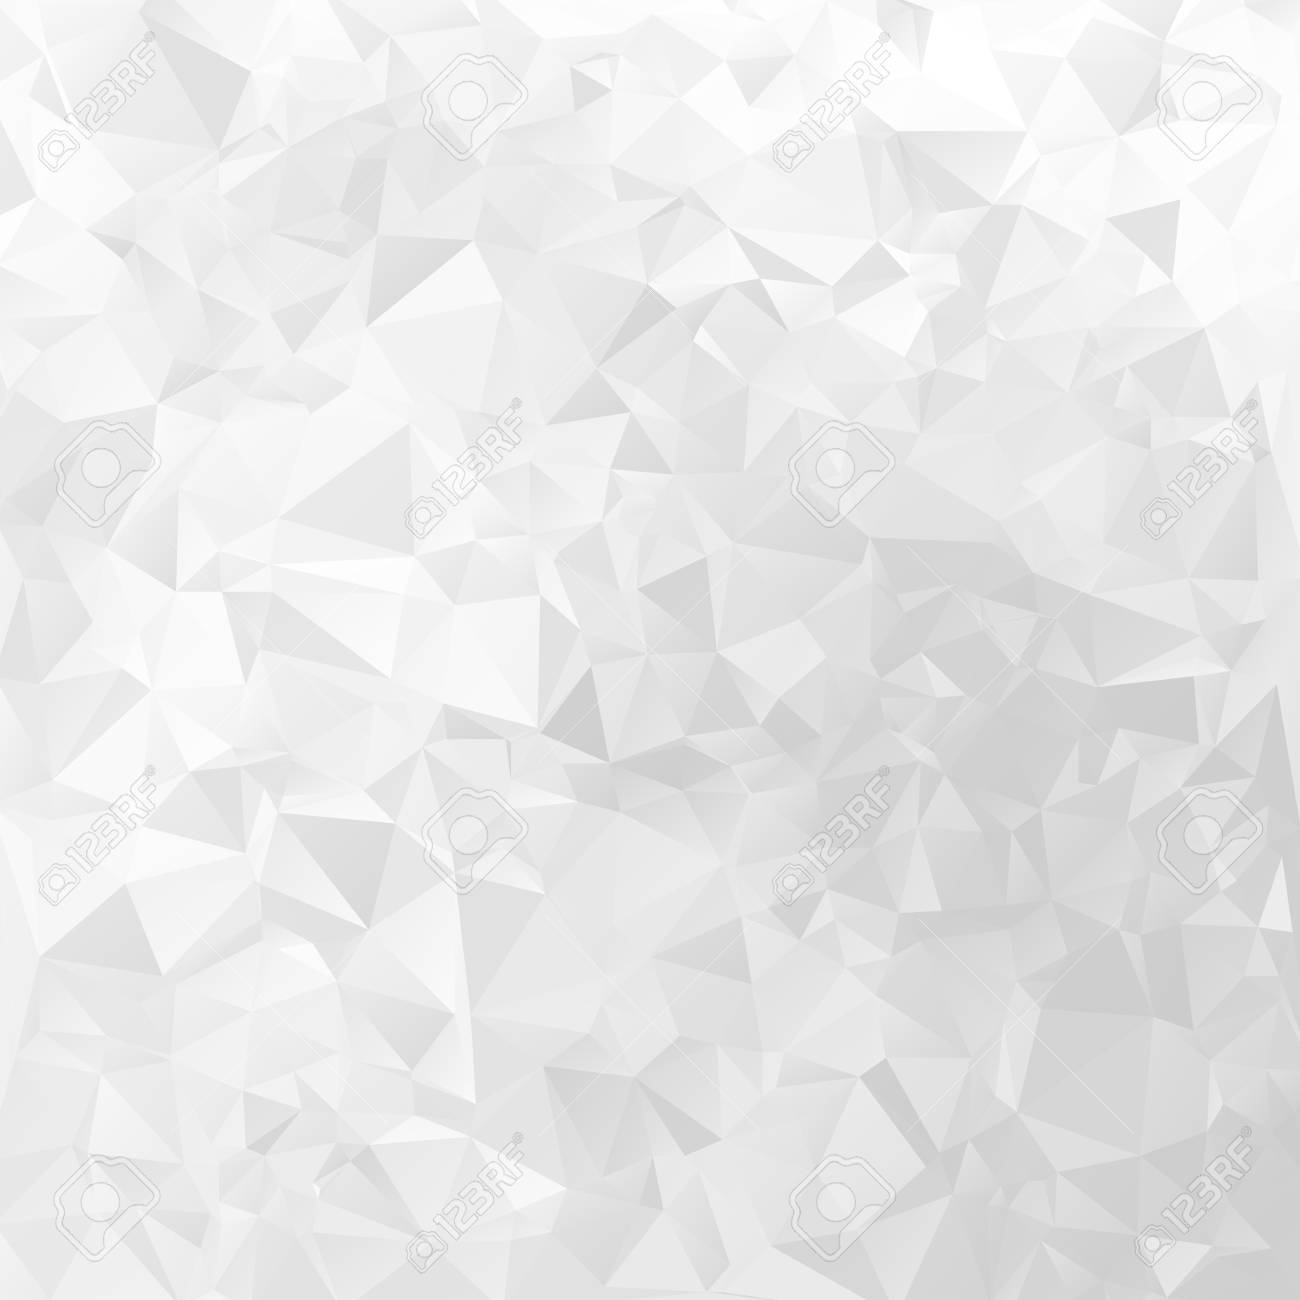 White geometrical vector background triangular design pattern - 125693923